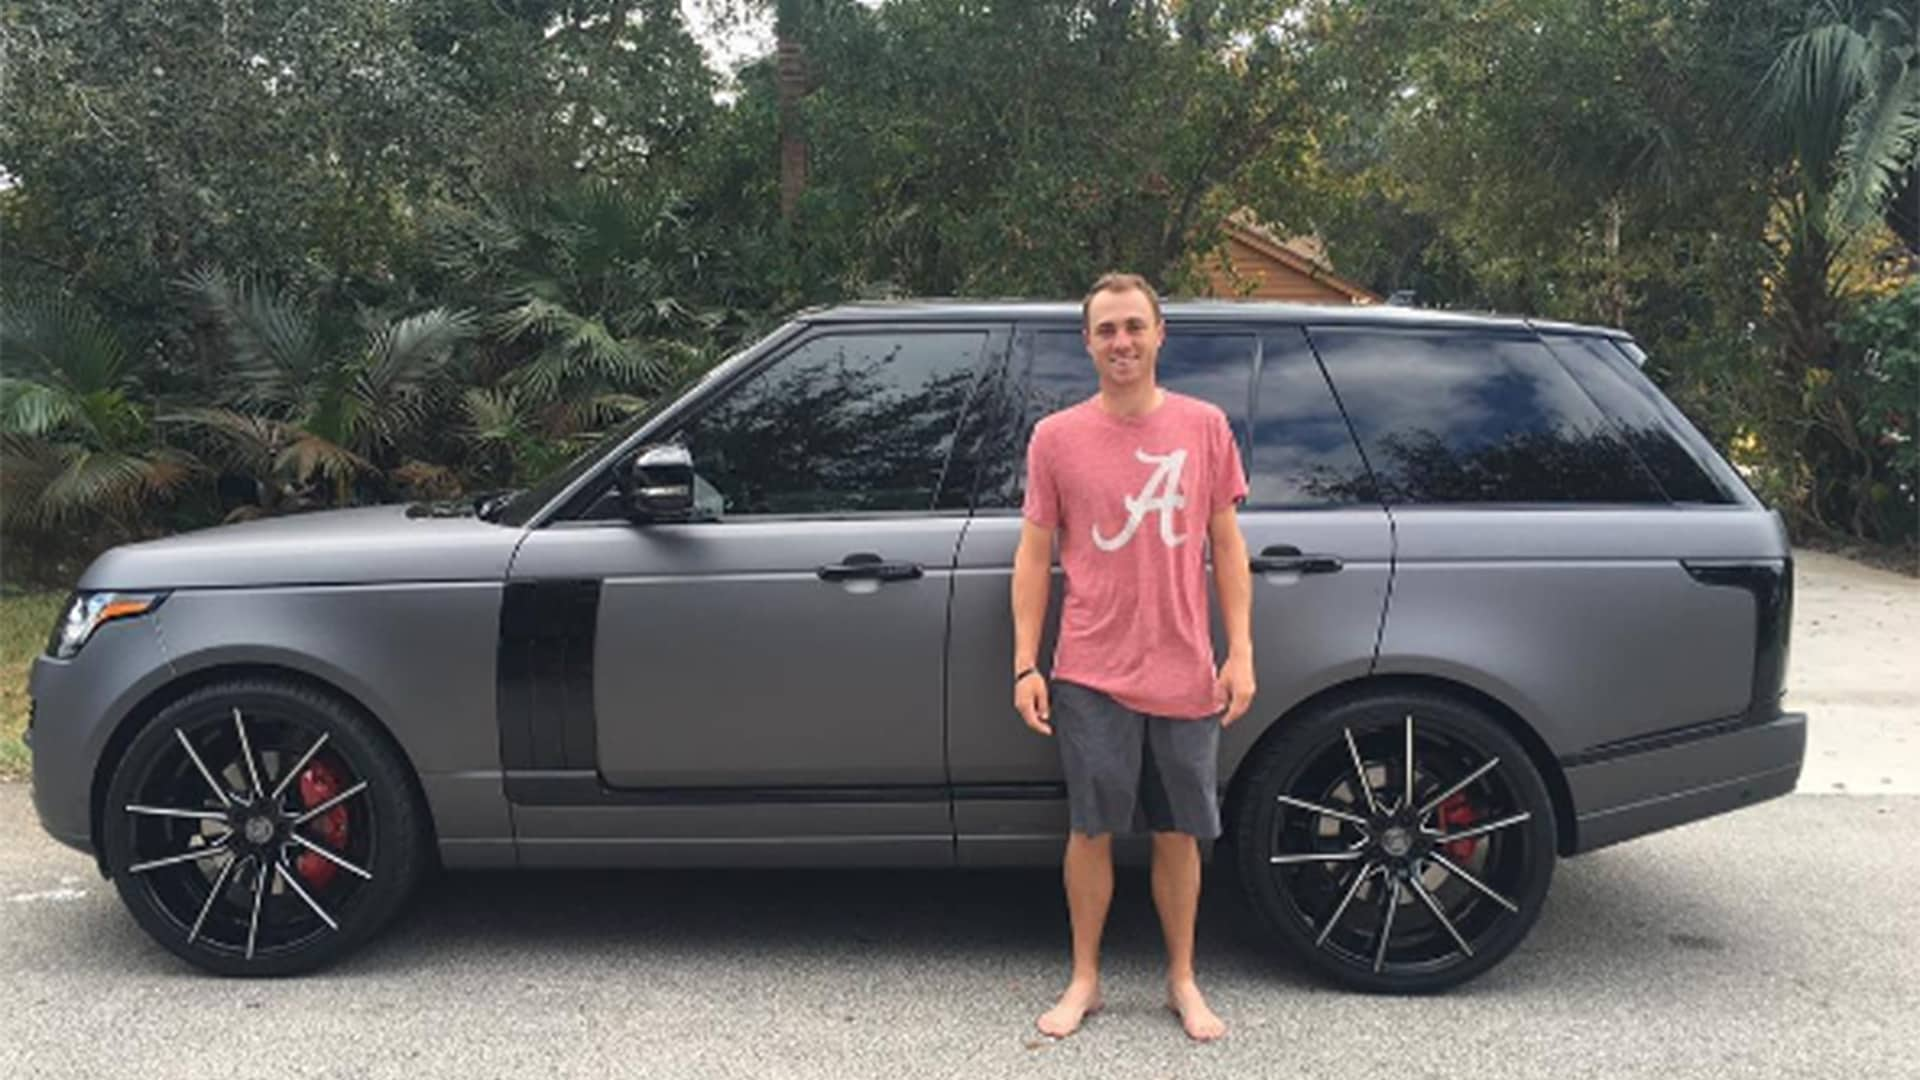 justin thomas celebrates two wins with custom range rover